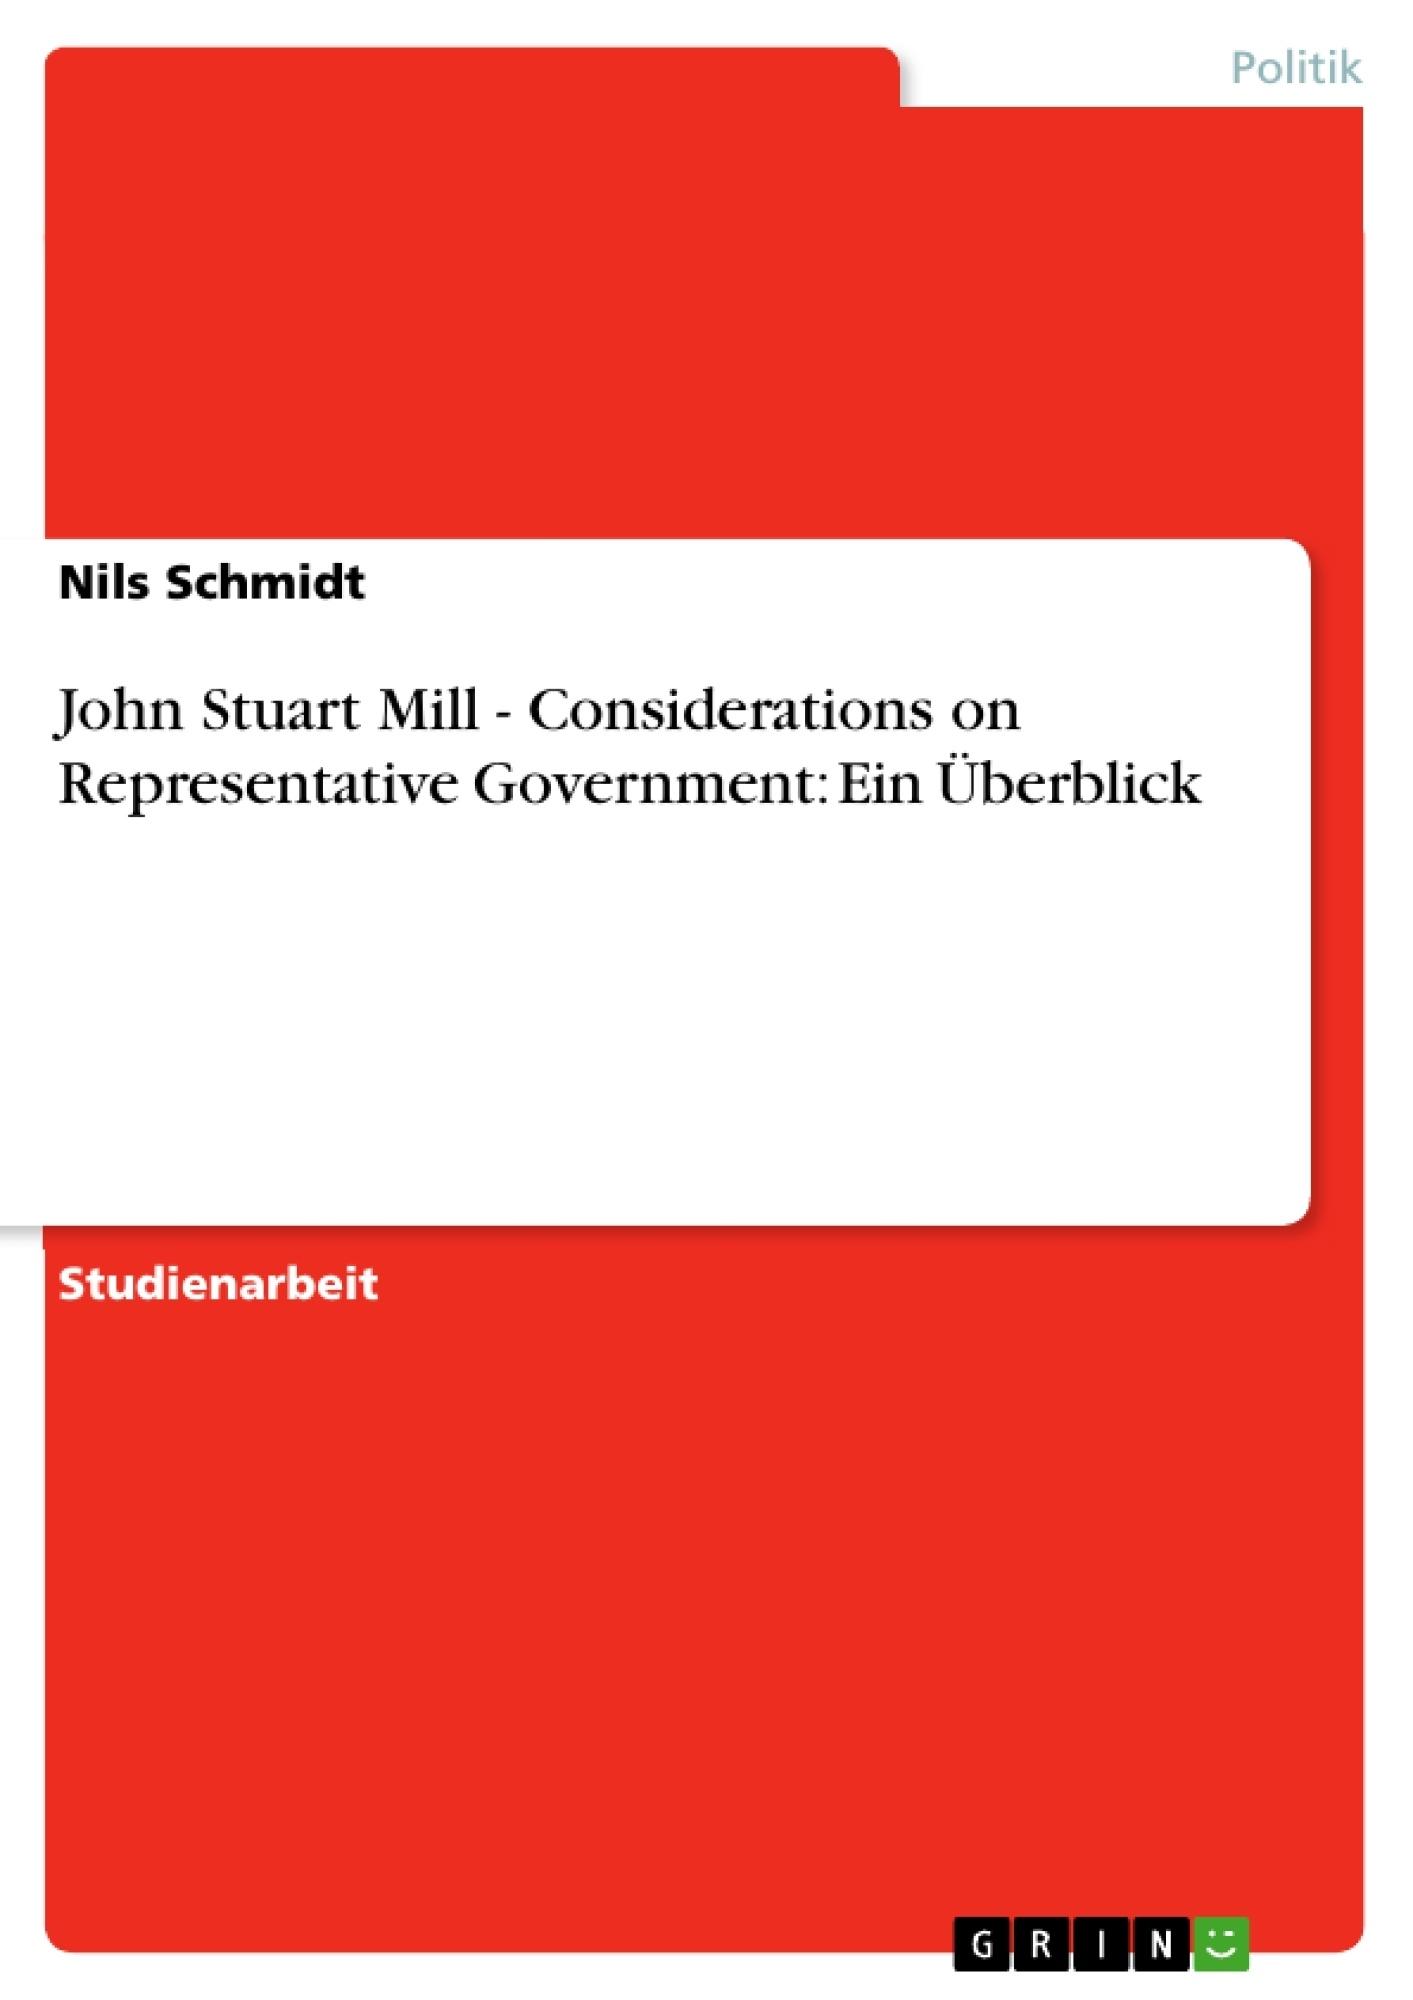 Titel: John Stuart Mill - Considerations on Representative Government: Ein Überblick